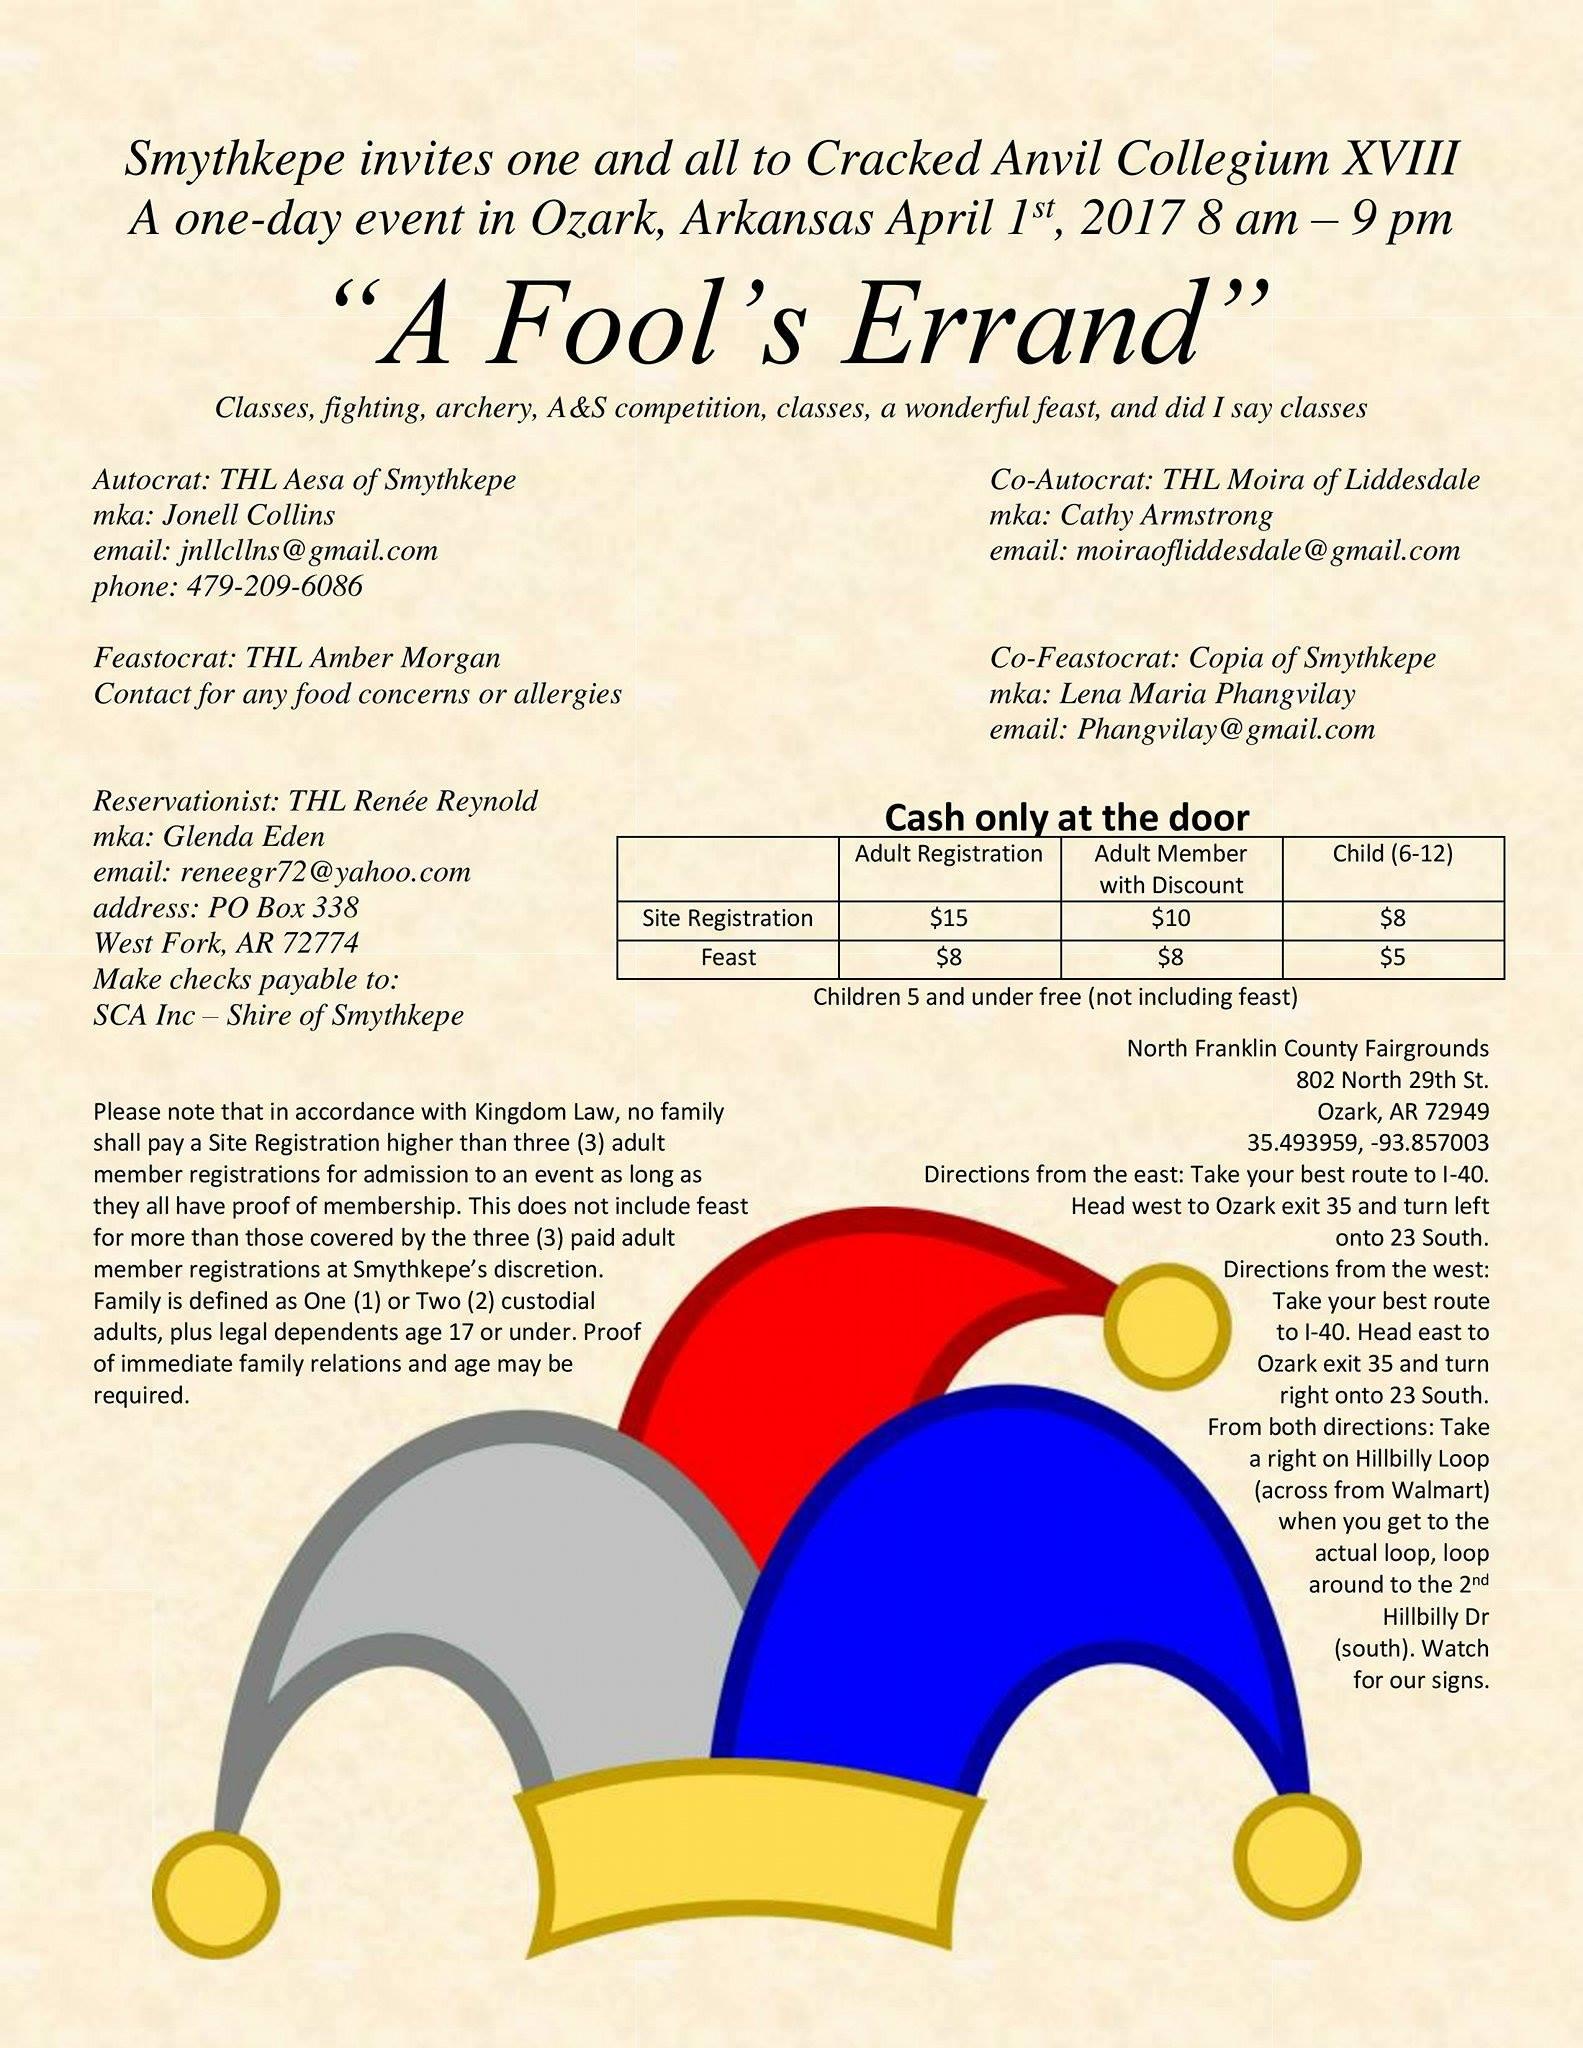 A Fool's Errand @ North Franklin County Fairgrounds